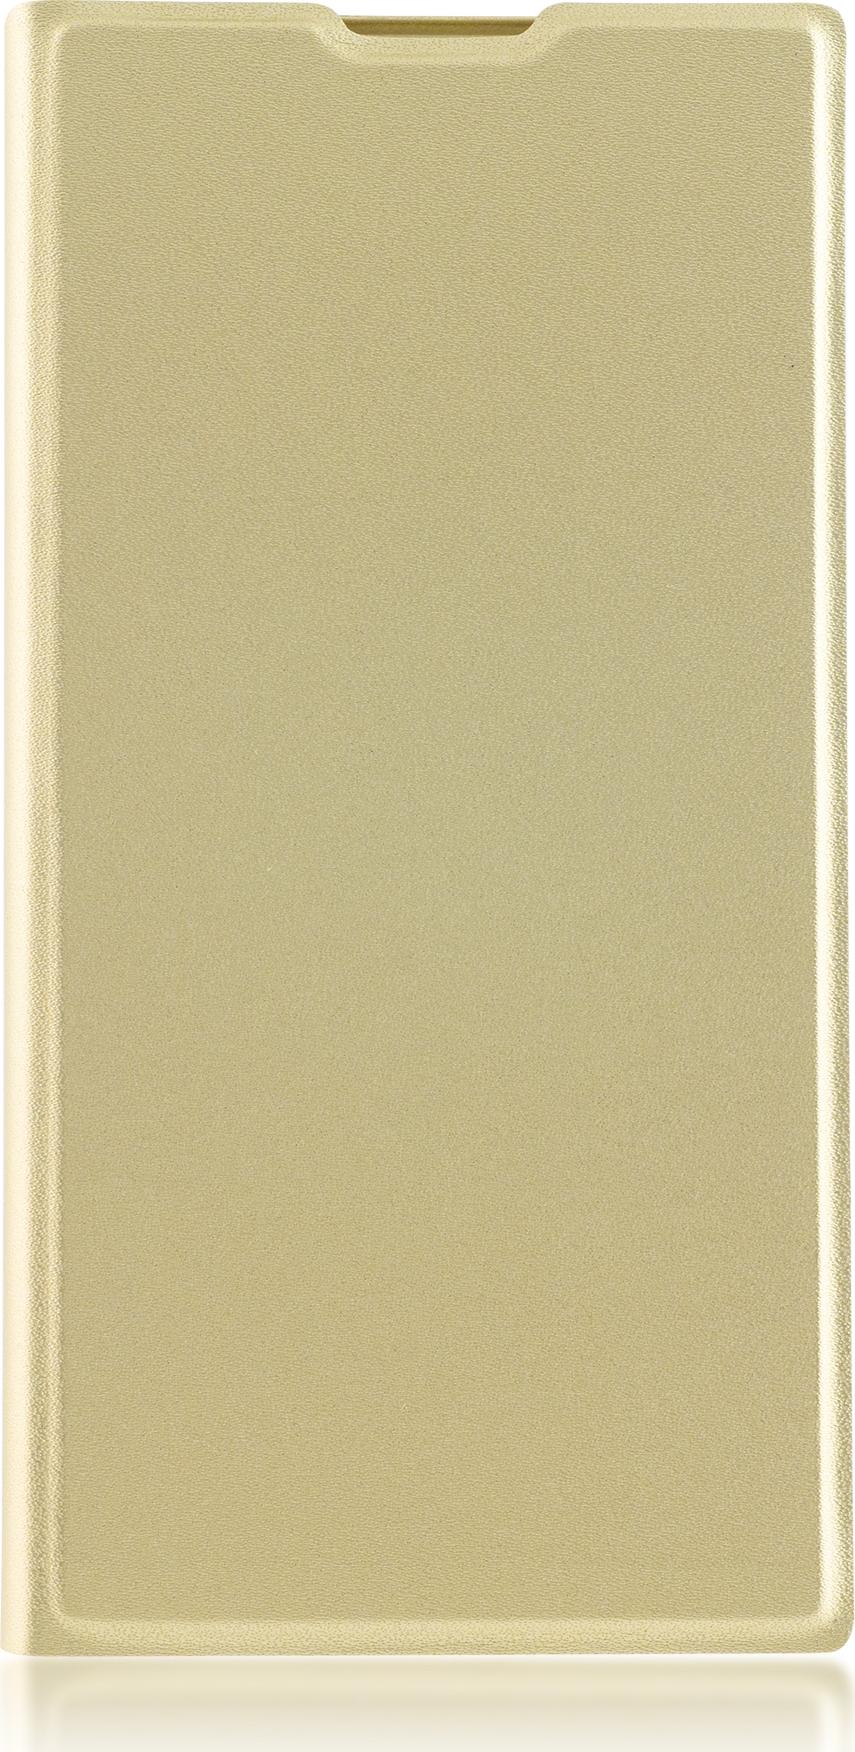 Чехол Brosco Book для Sony Xperia XA2 Ultra, золотой